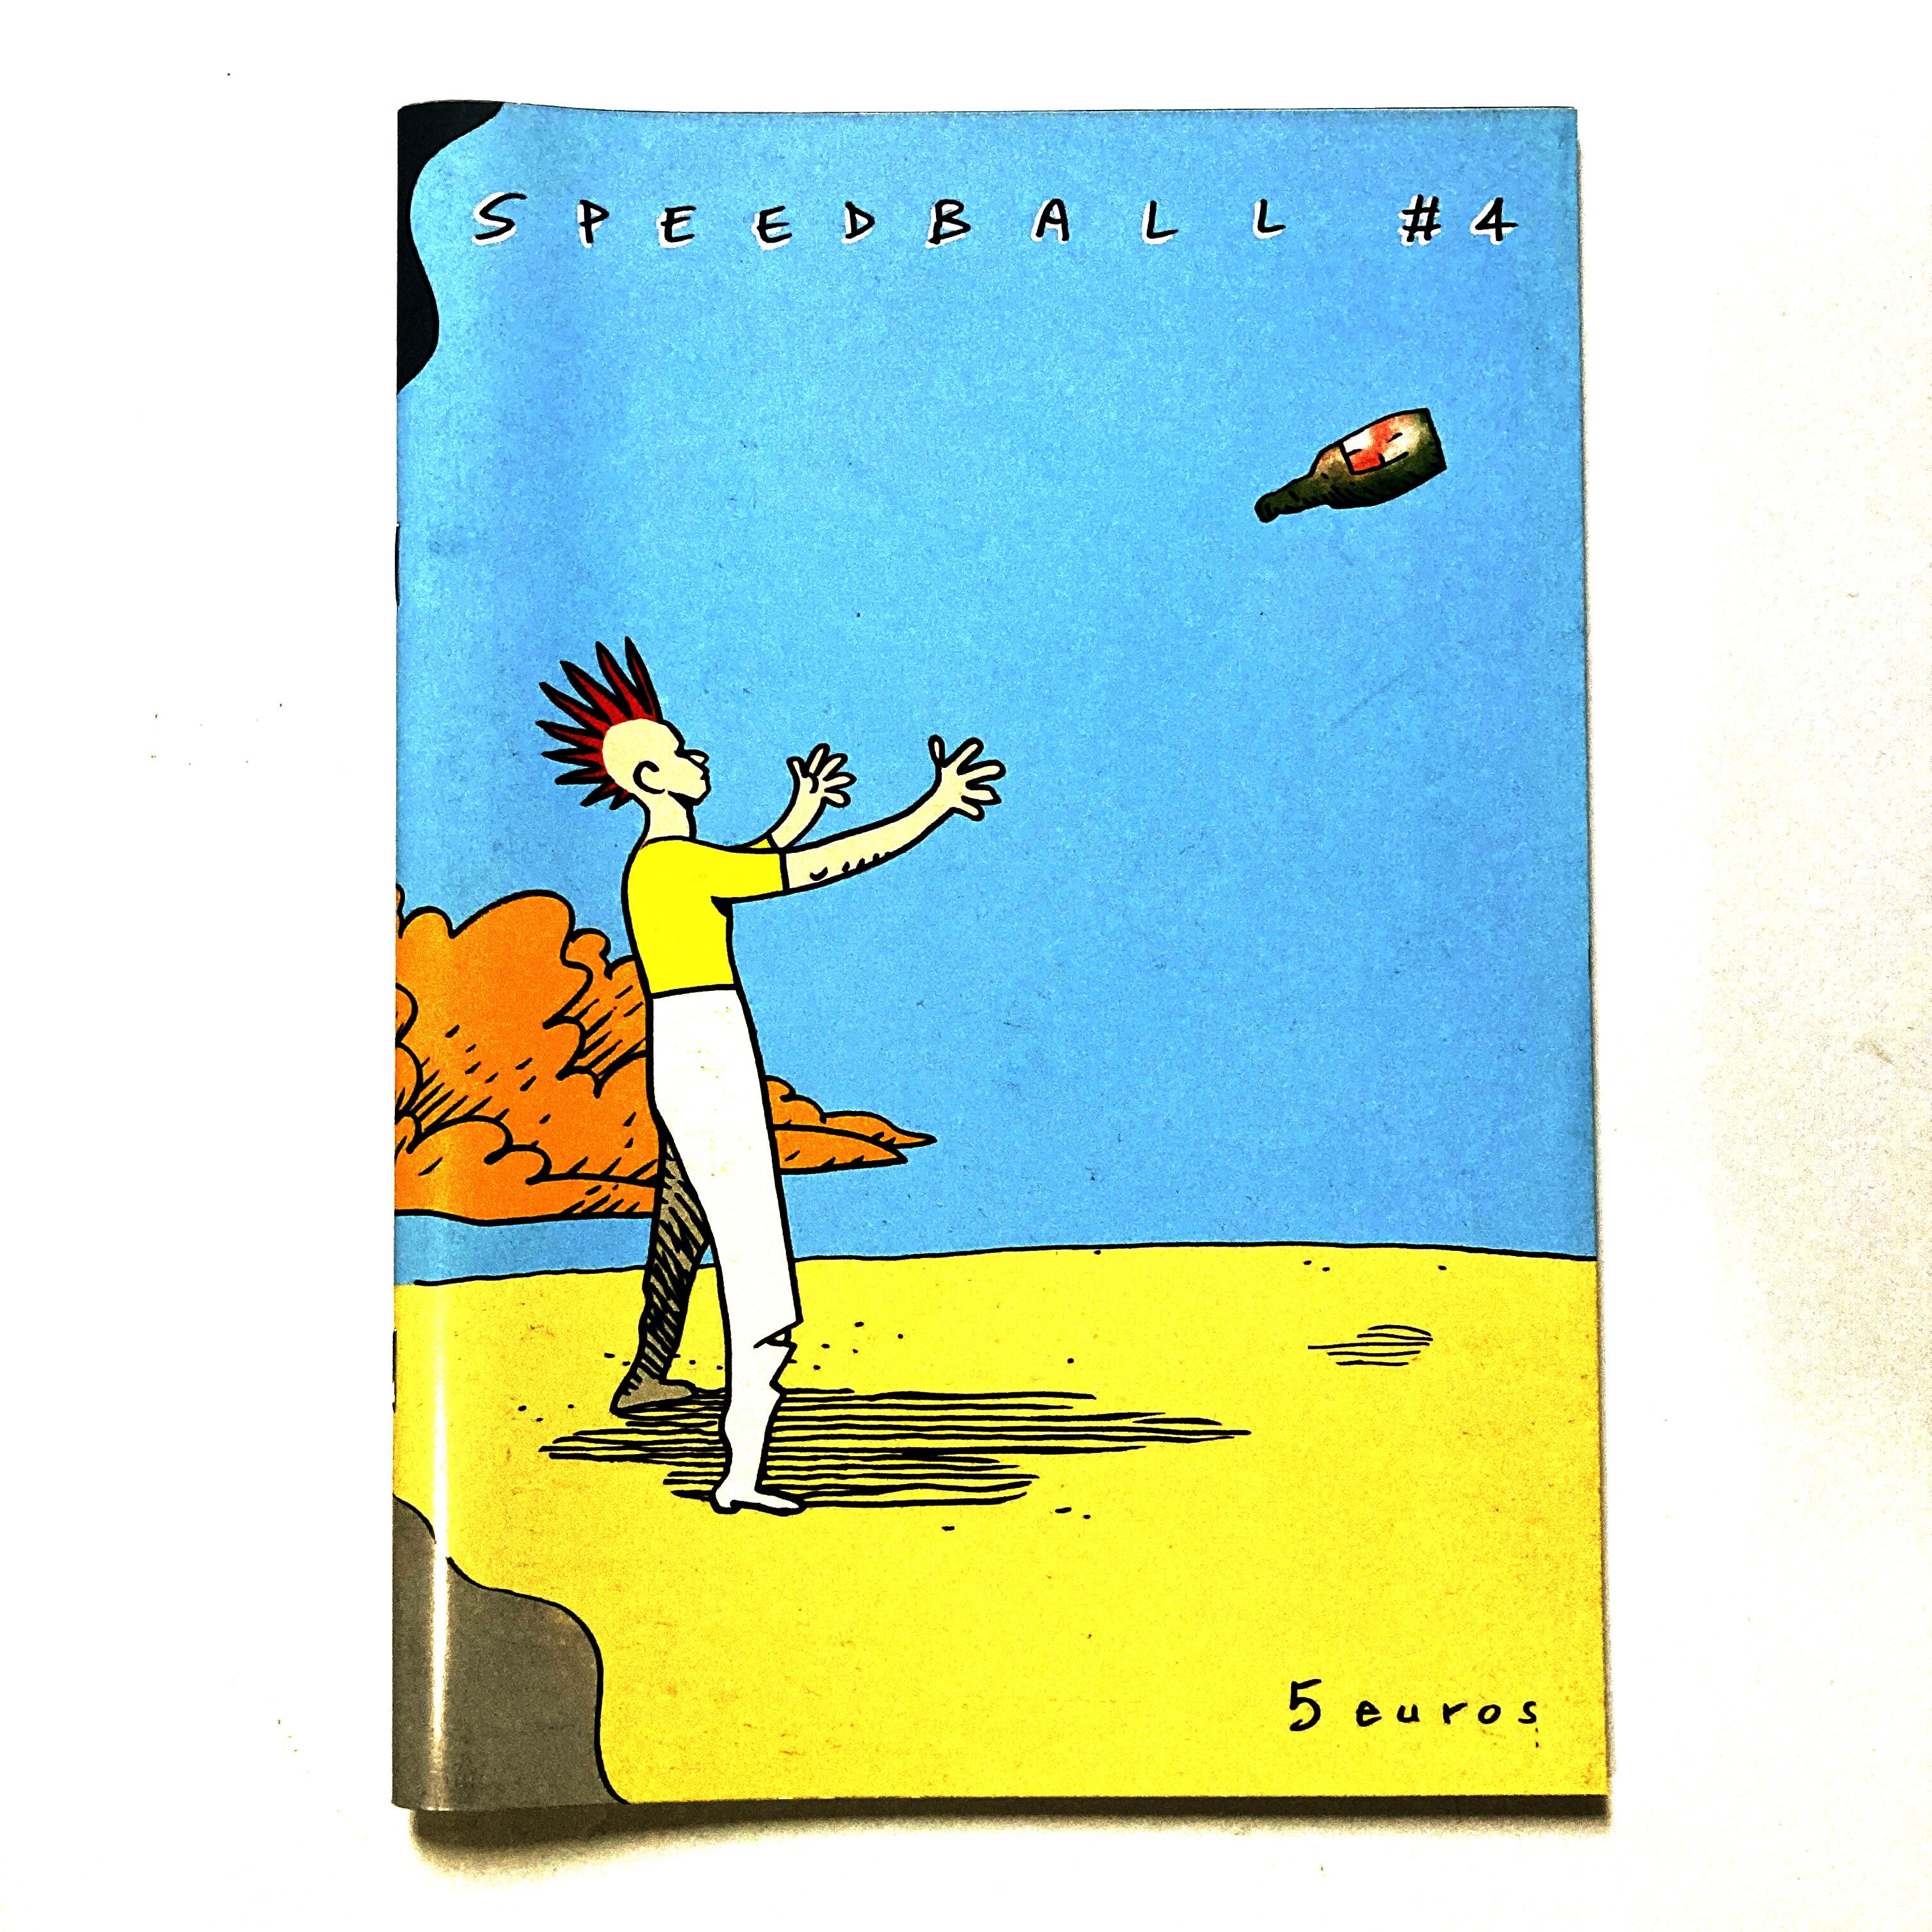 Speedball #4 - punk & science fiction